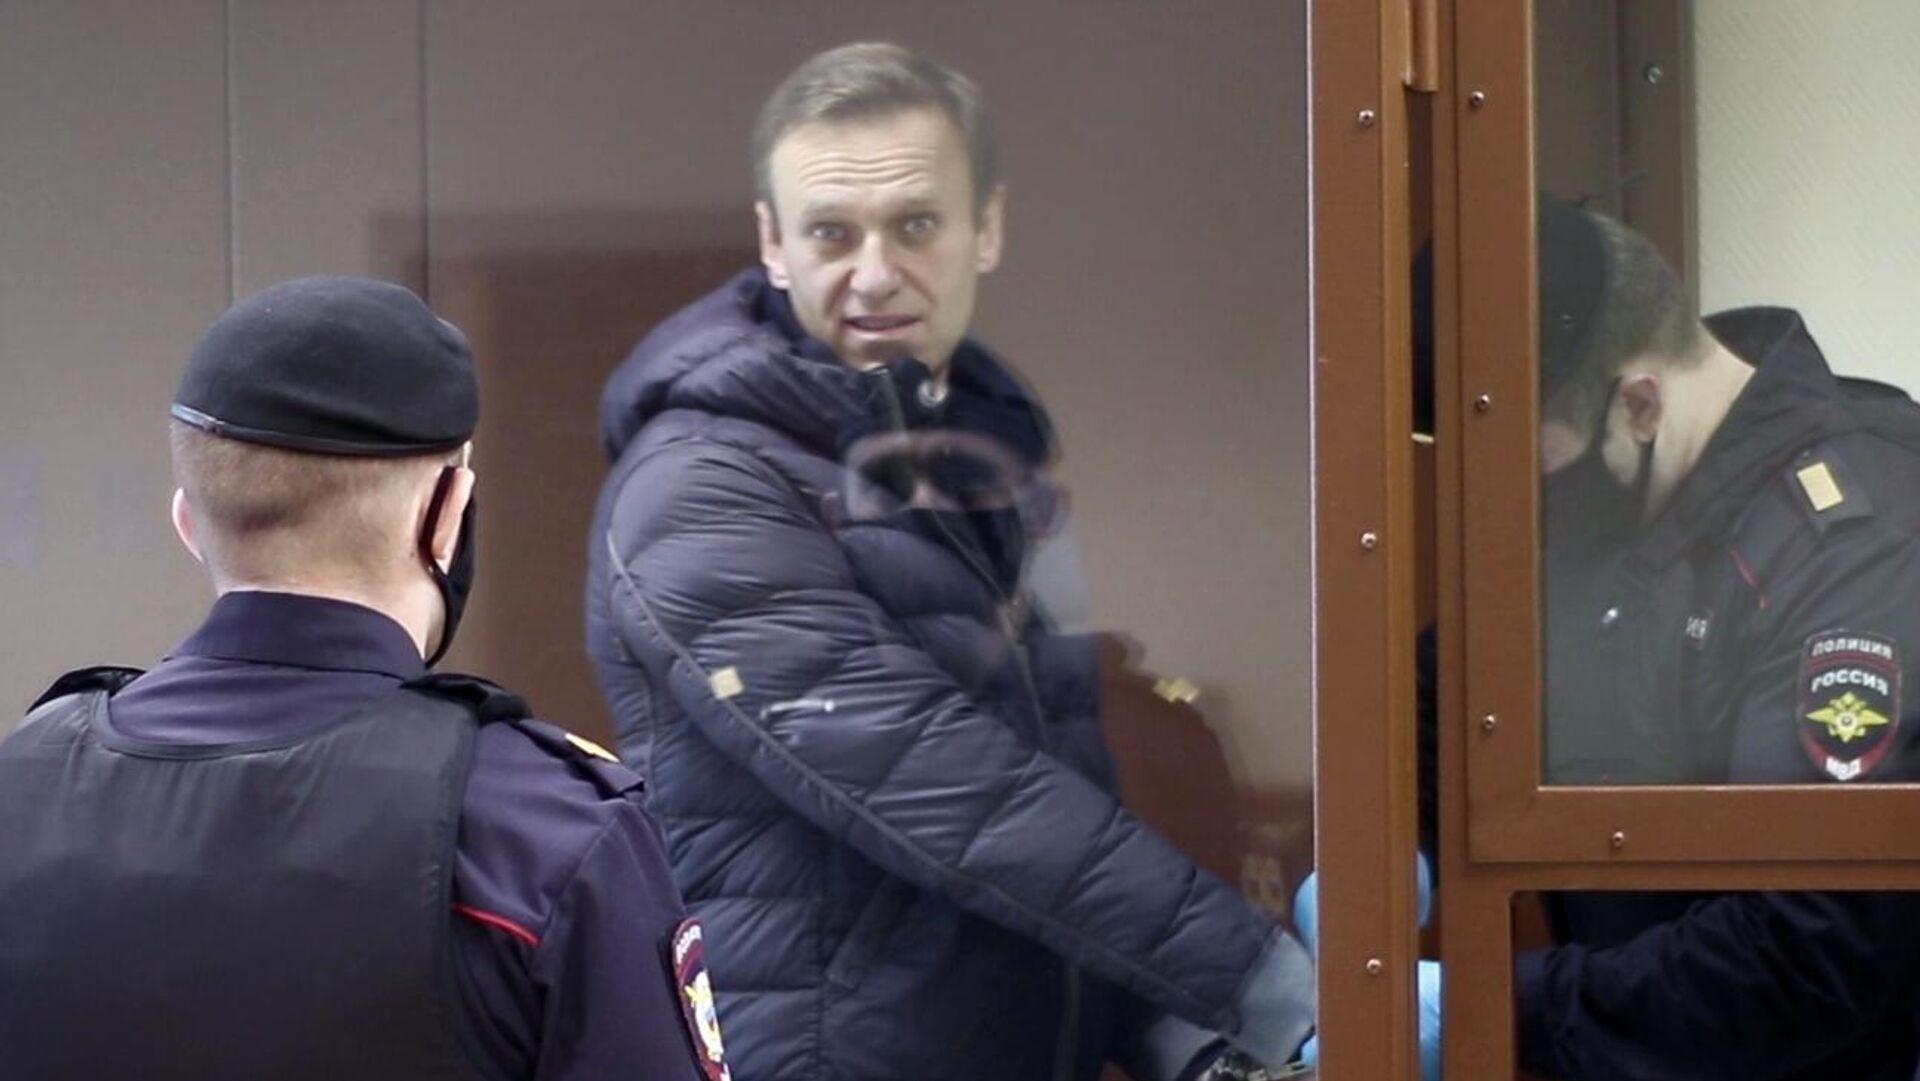 Alexéi Navalni, bloguero opositor ruso - Sputnik Mundo, 1920, 19.02.2021